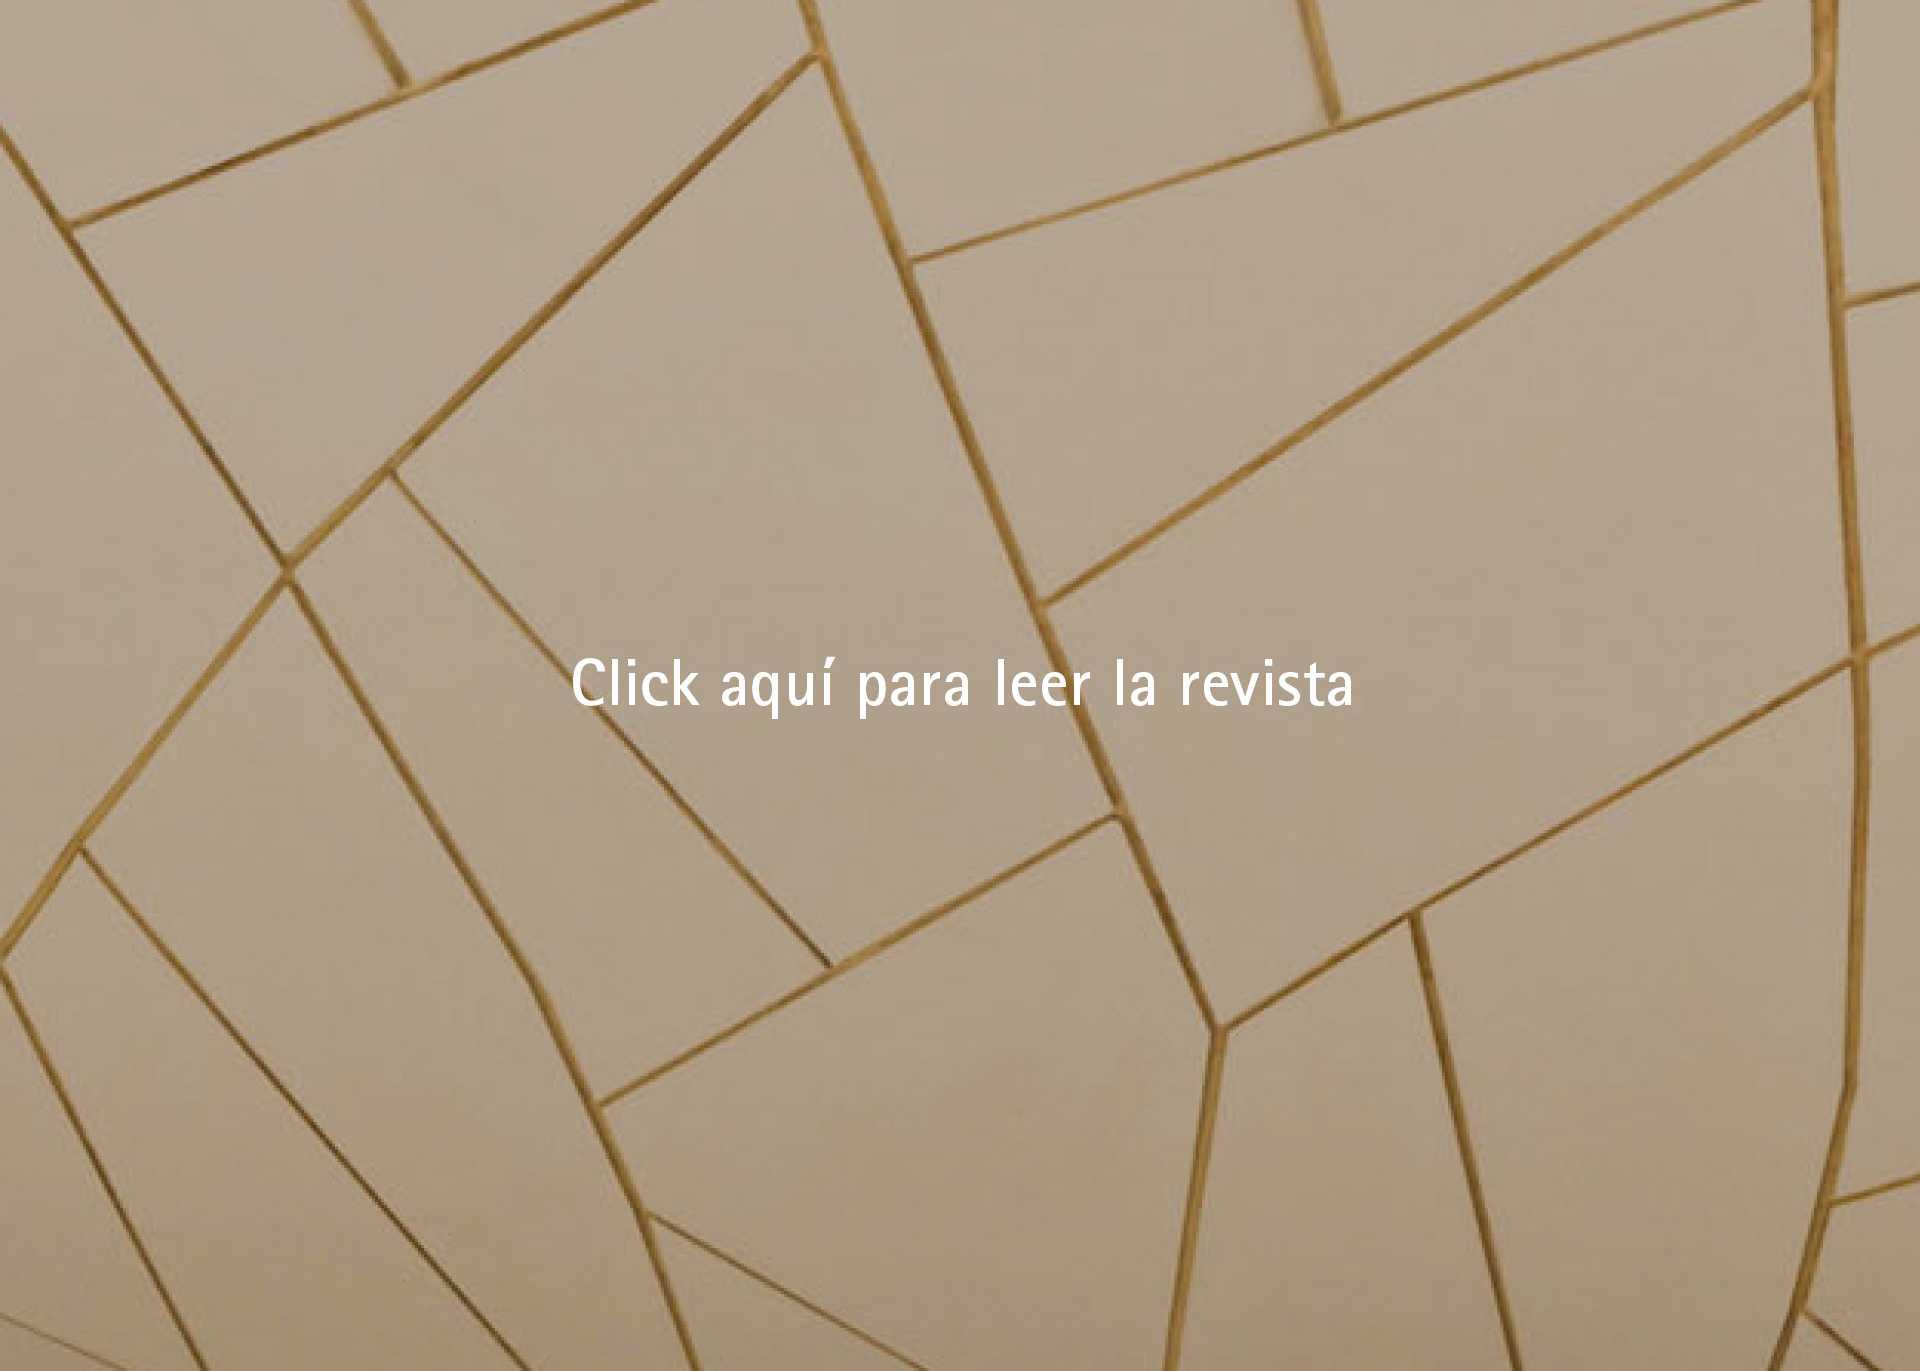 C15 Architecture & Everything else  - image c15 contenido 31